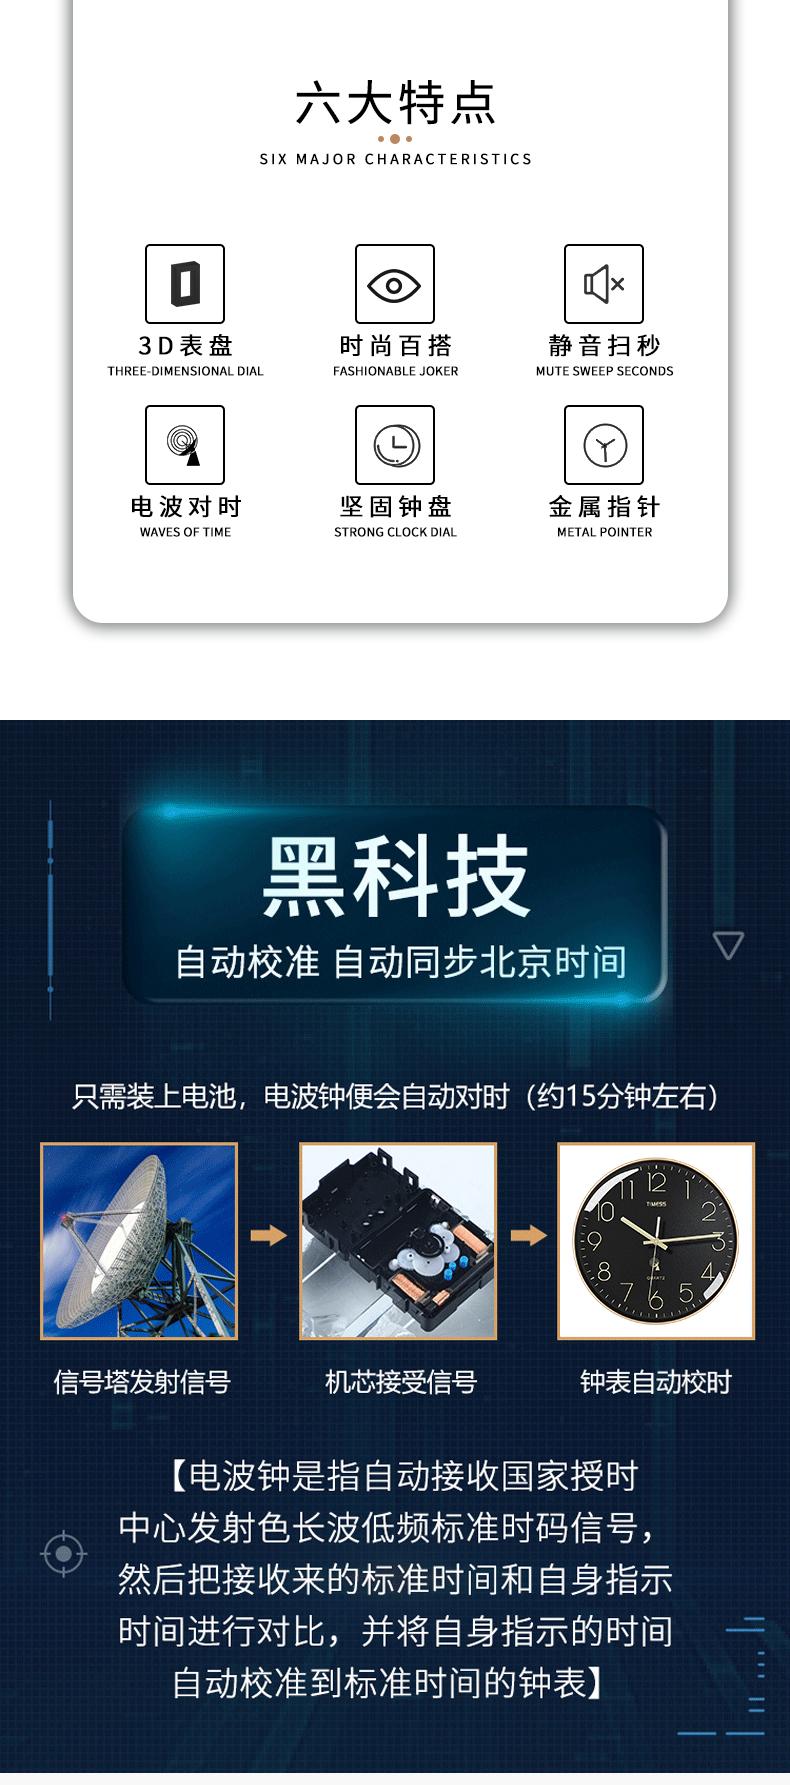 TIMESS 中国码电波表 日期温度显示 自动对时分秒不差 图2